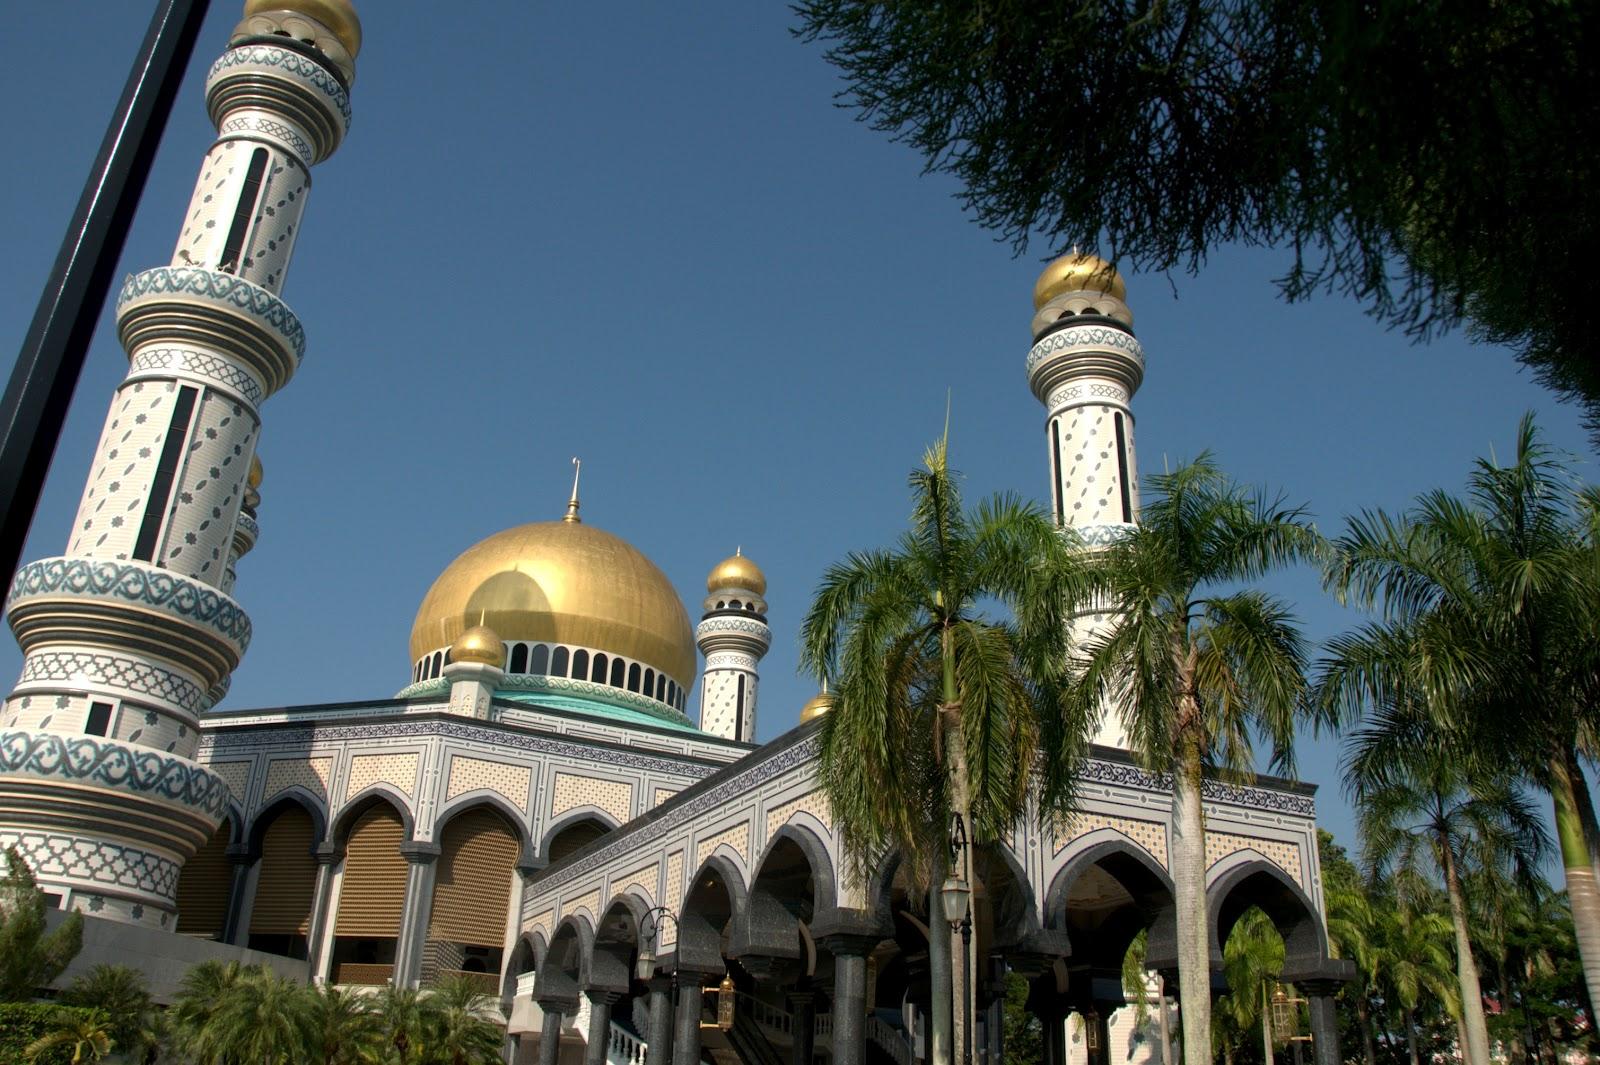 Downtown Bandar Seri Begawan Brunei Darussalam Stock Photo ... |Bandar Seri Begawan Brunei Darussalam